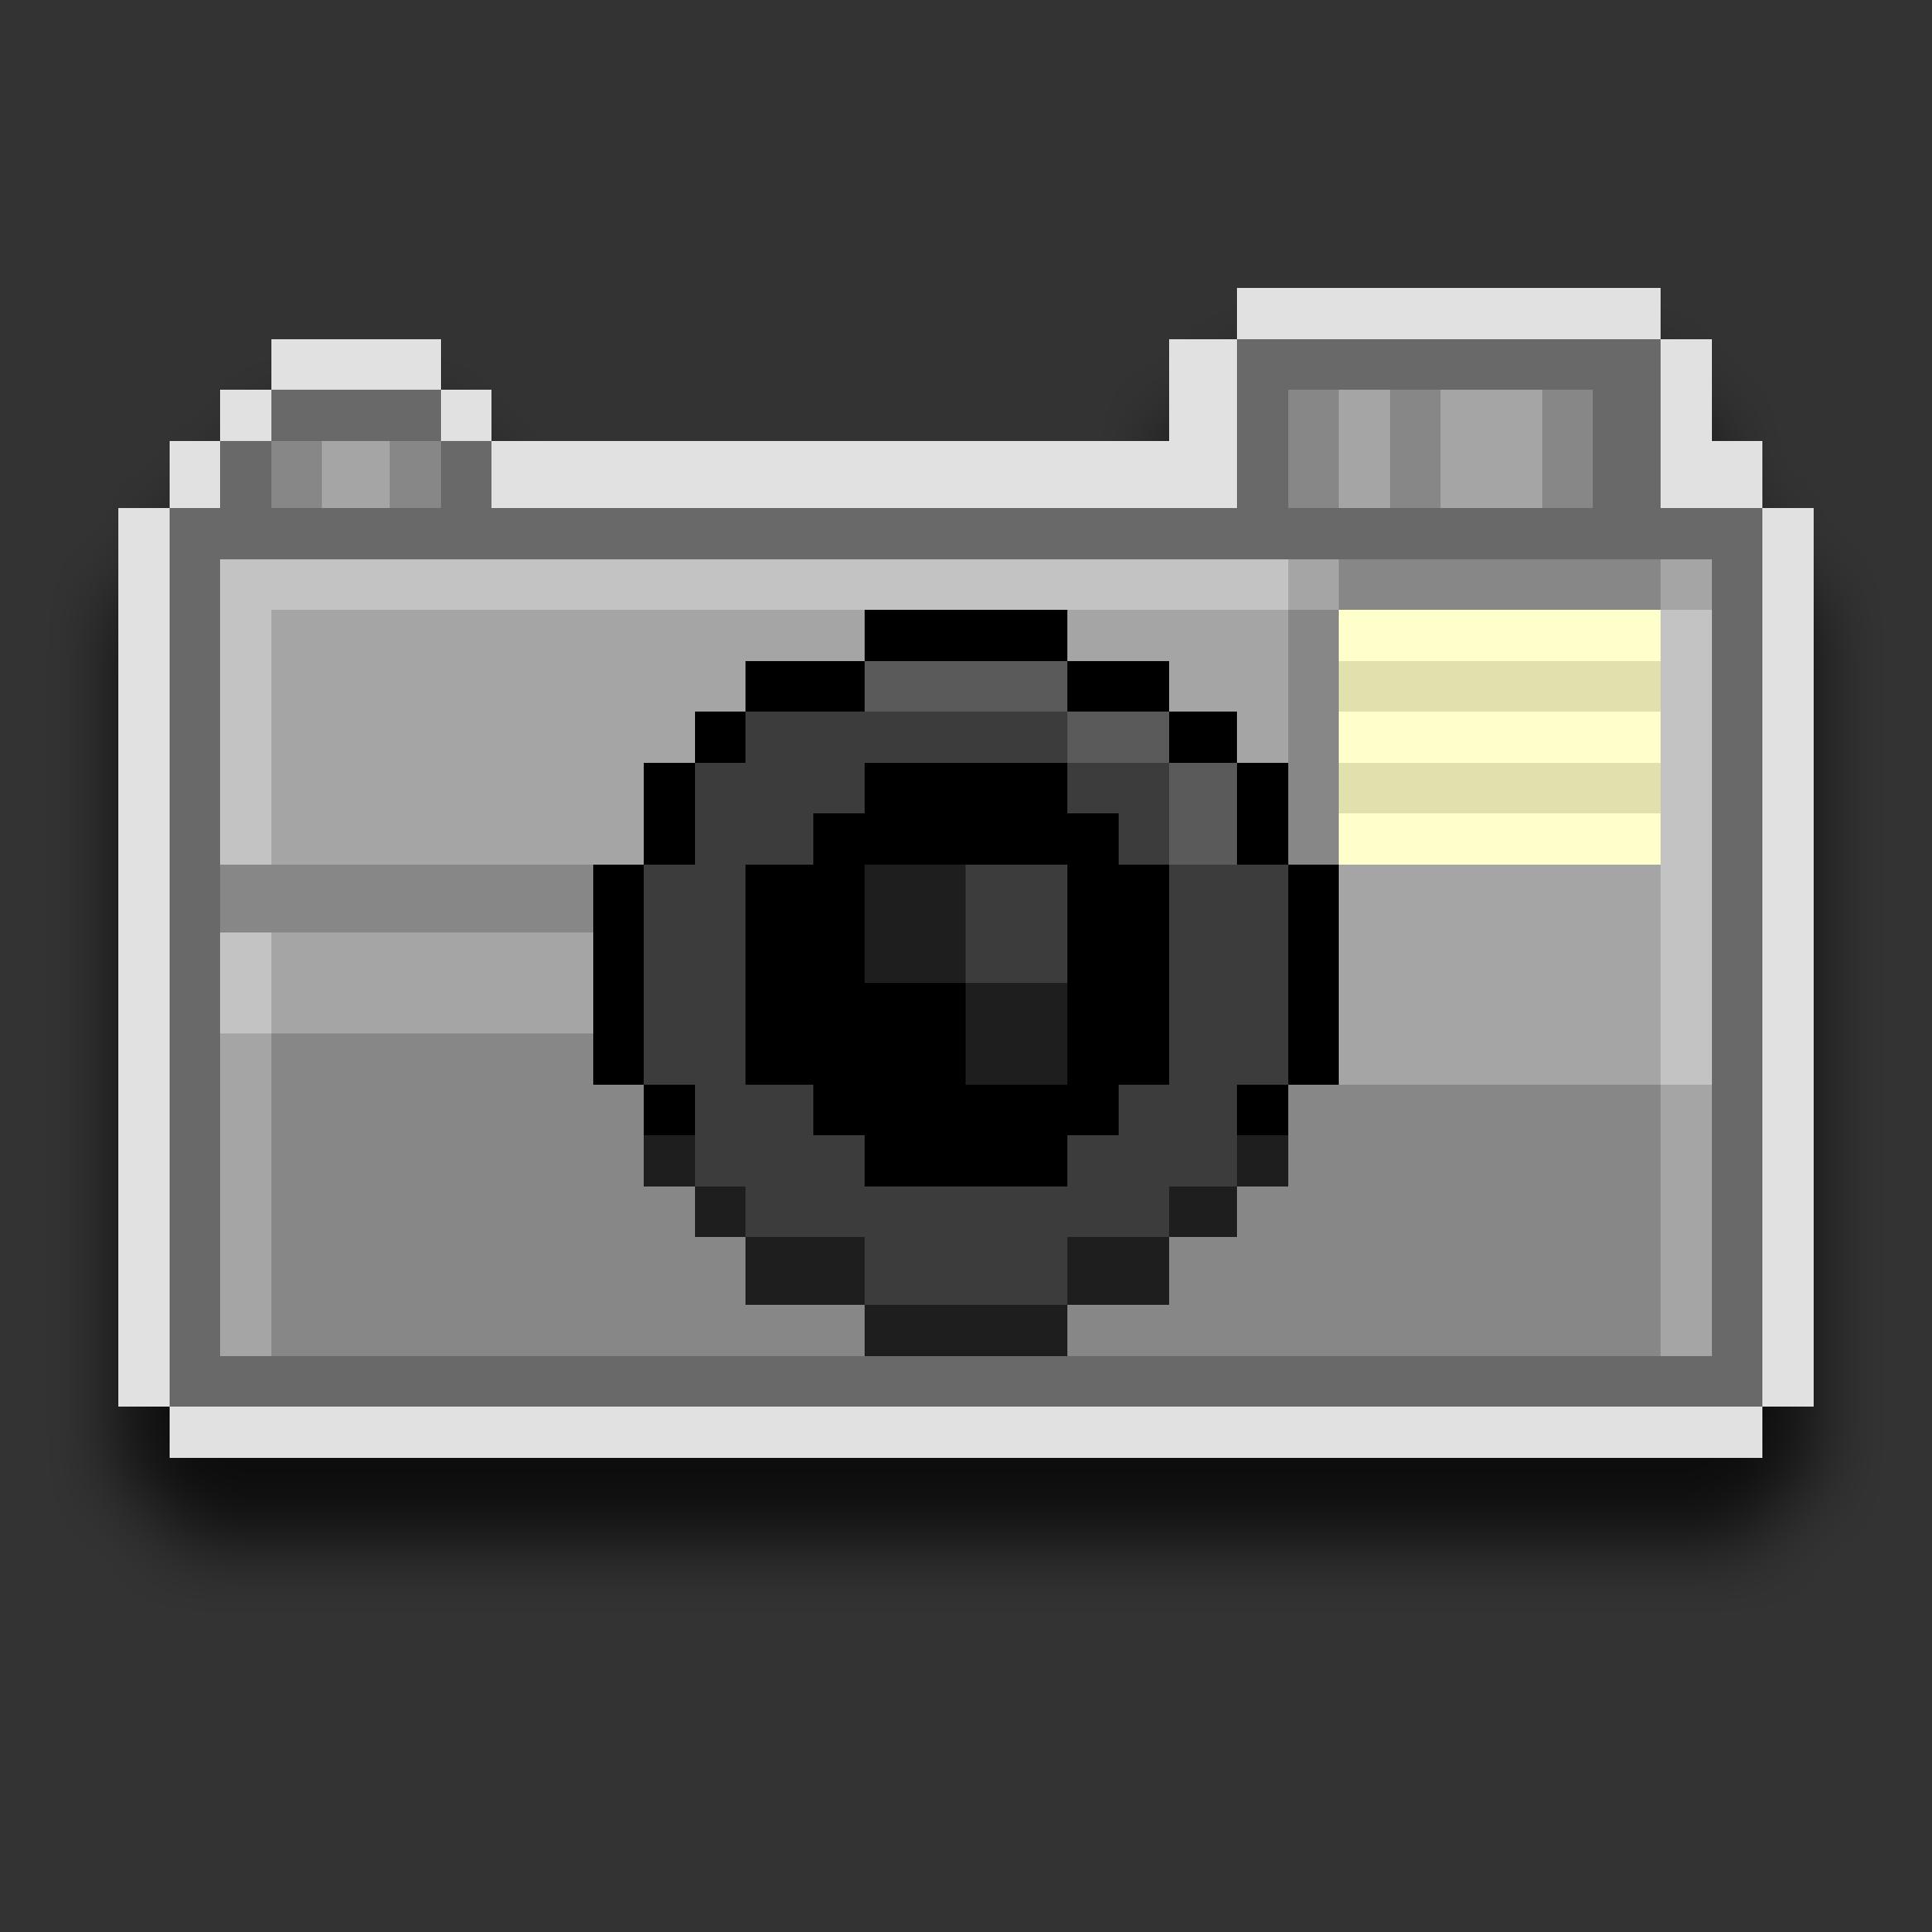 Drawn pixel art pixelated Mac Pixel the Make Make